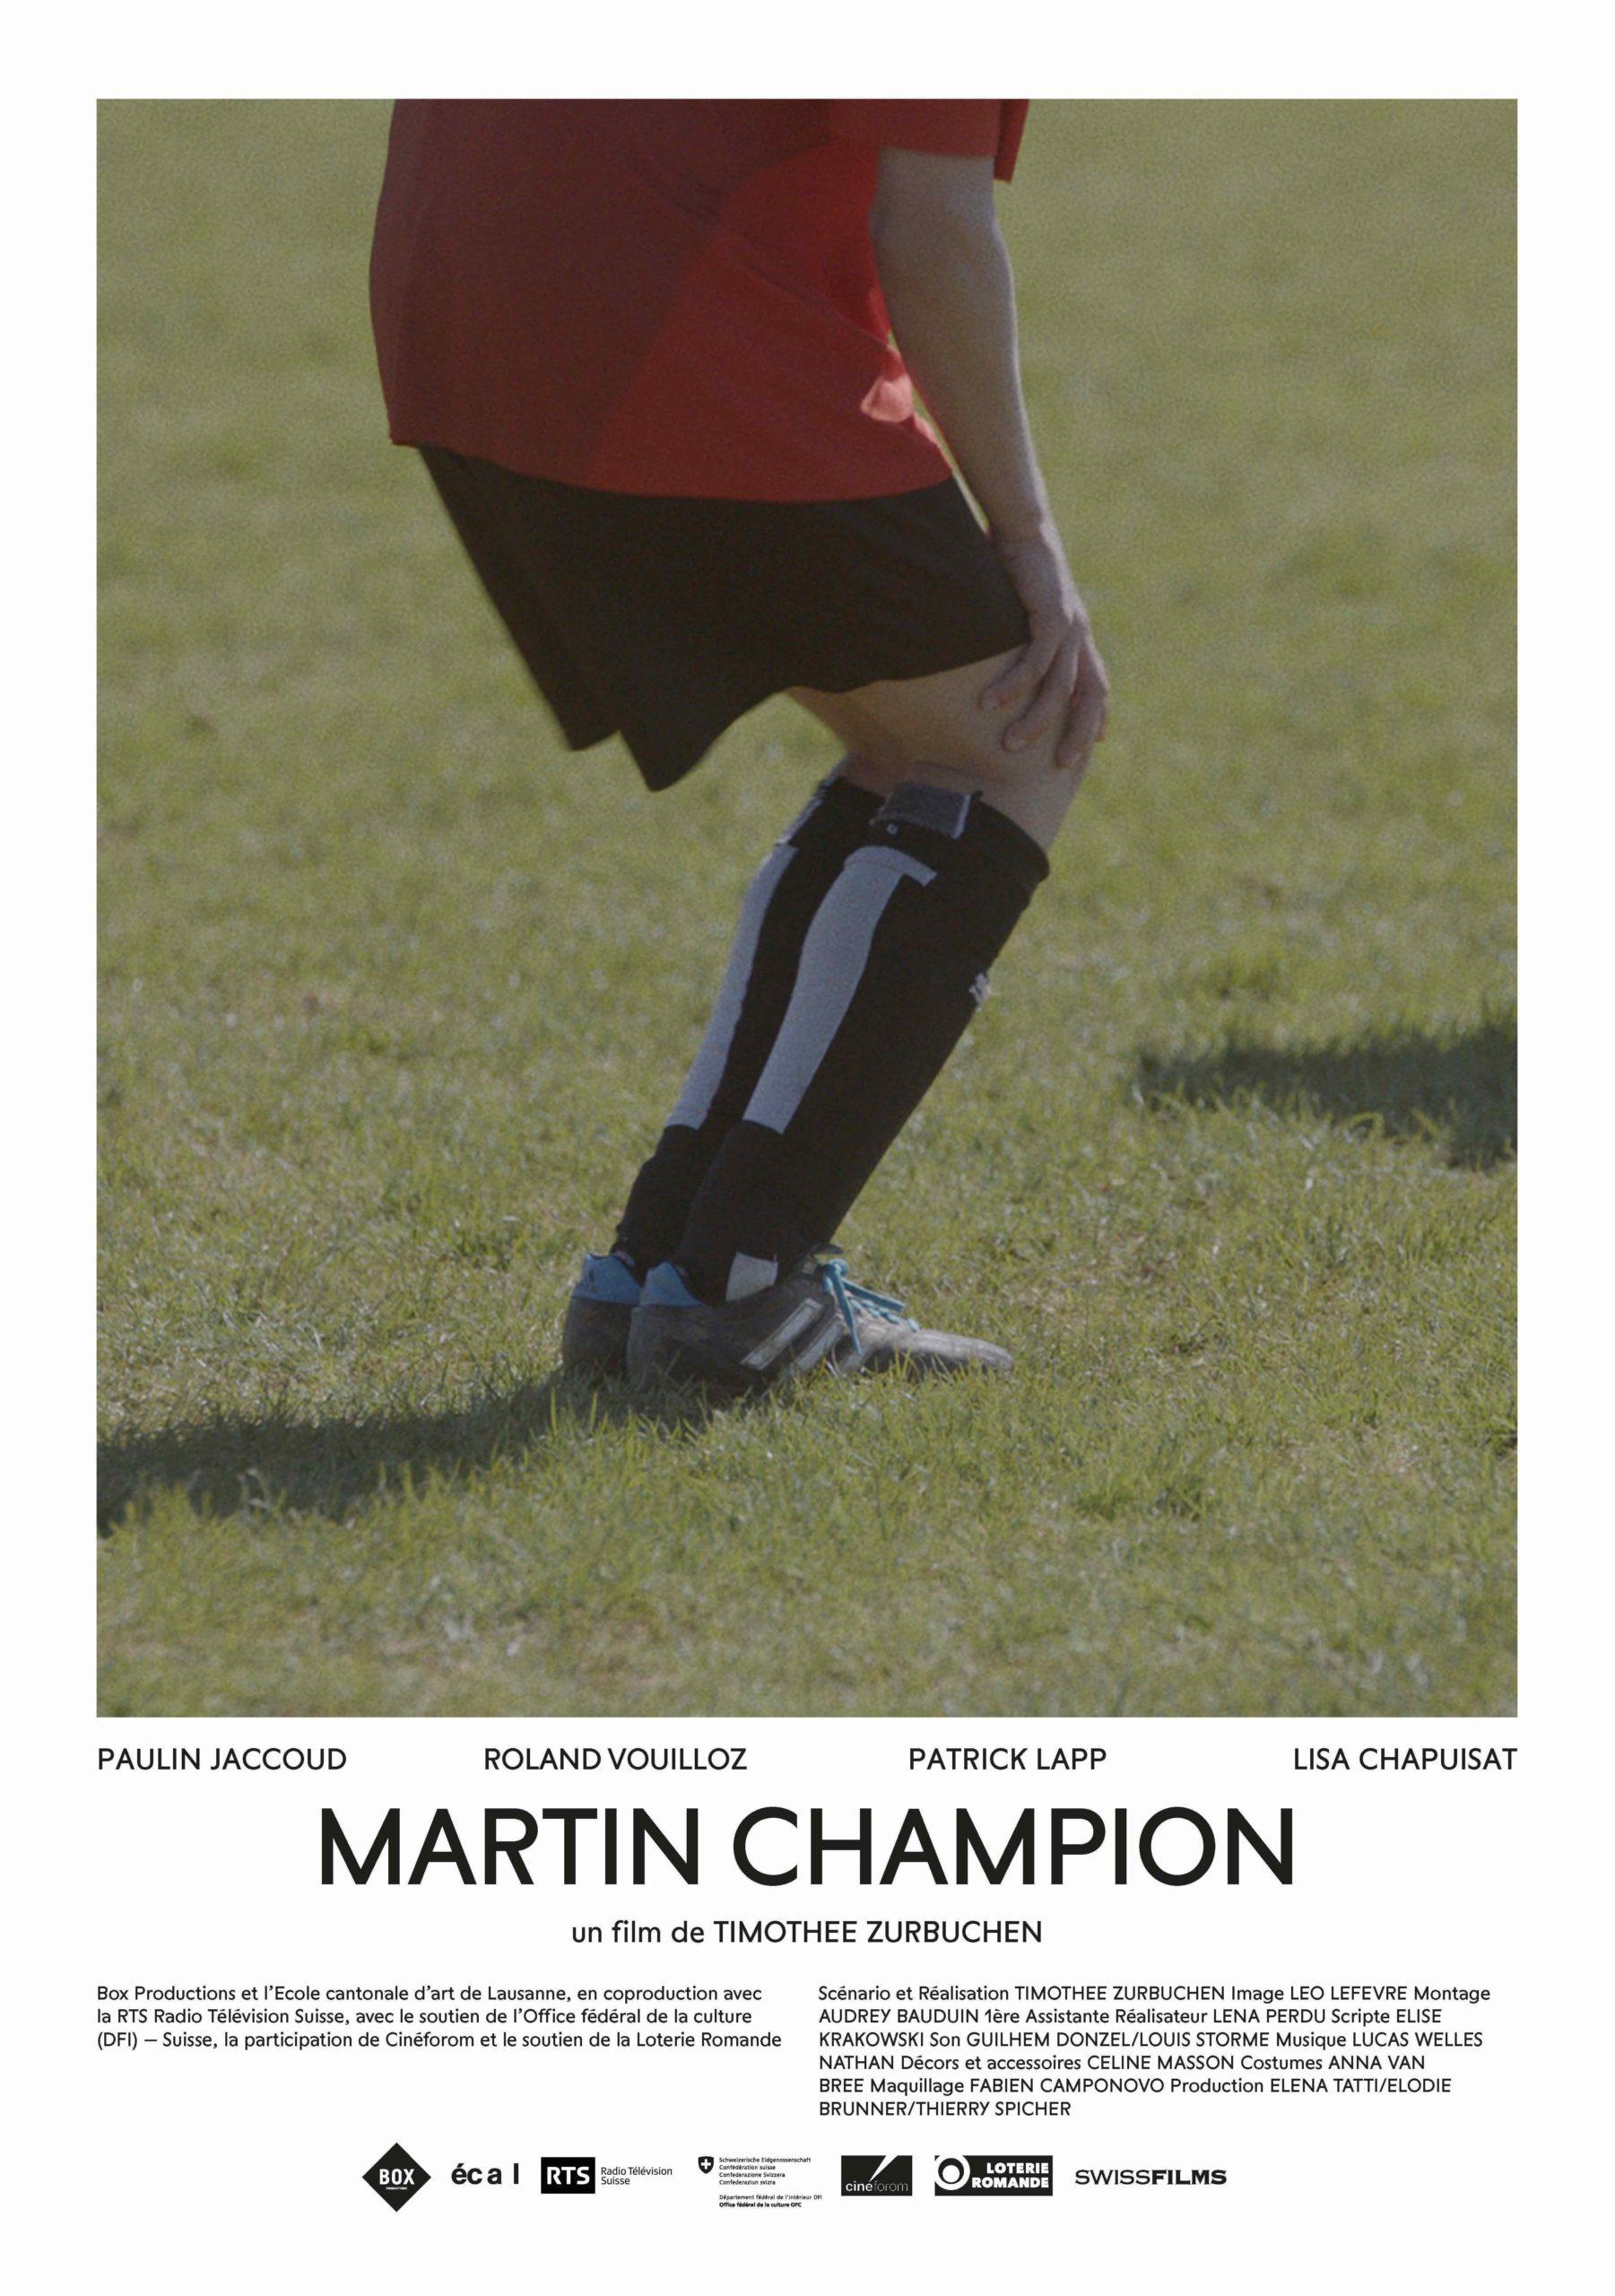 Martin Champion